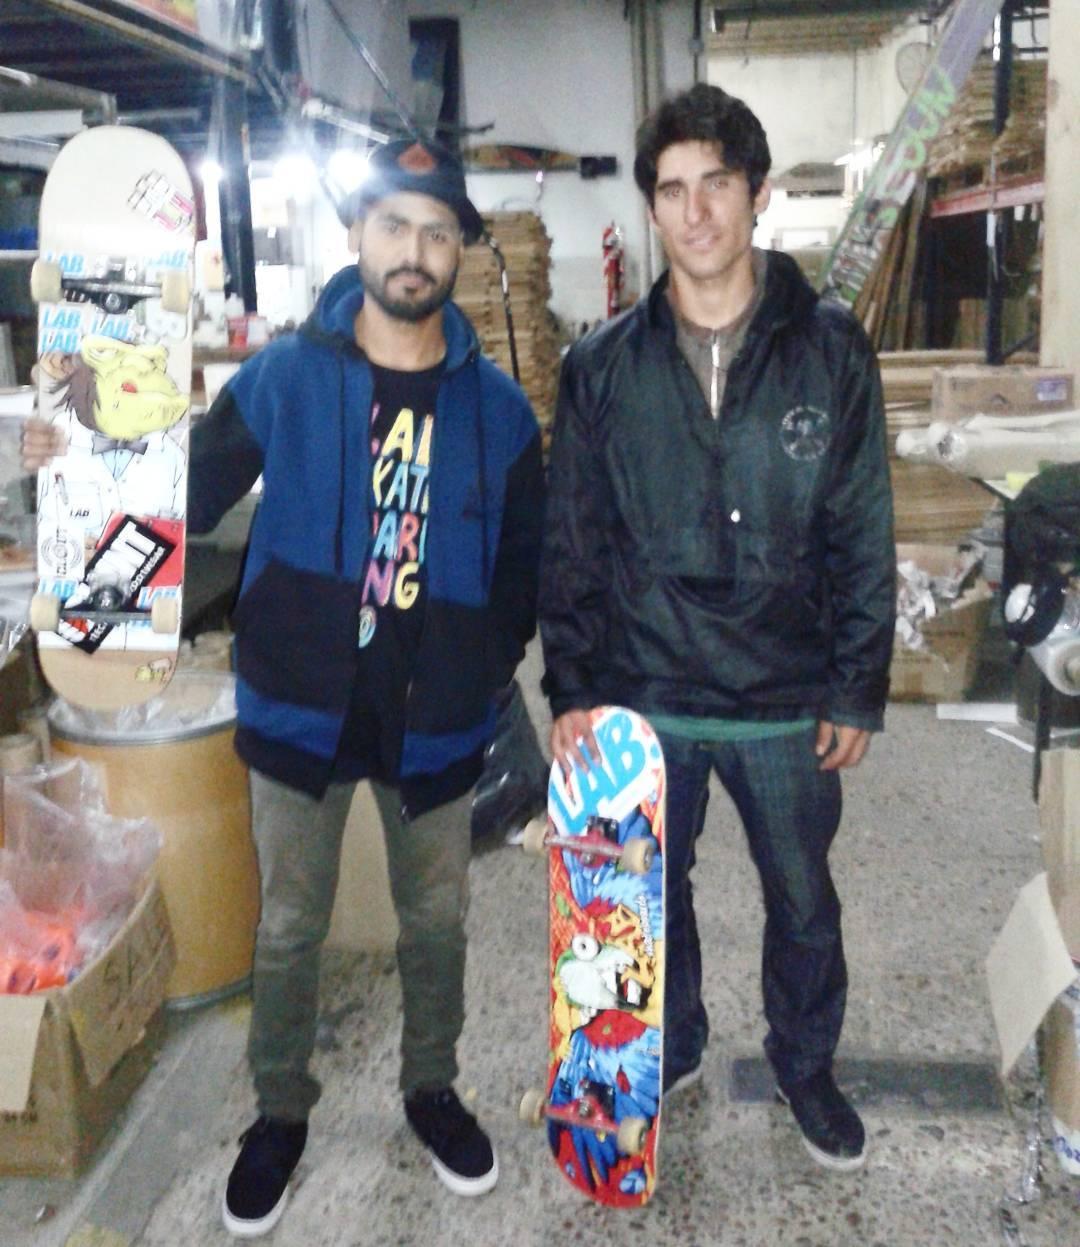 Jandro Diaz + Ivan Jofre visitando @labskateboarding  #lab #jandro #jofre #skate